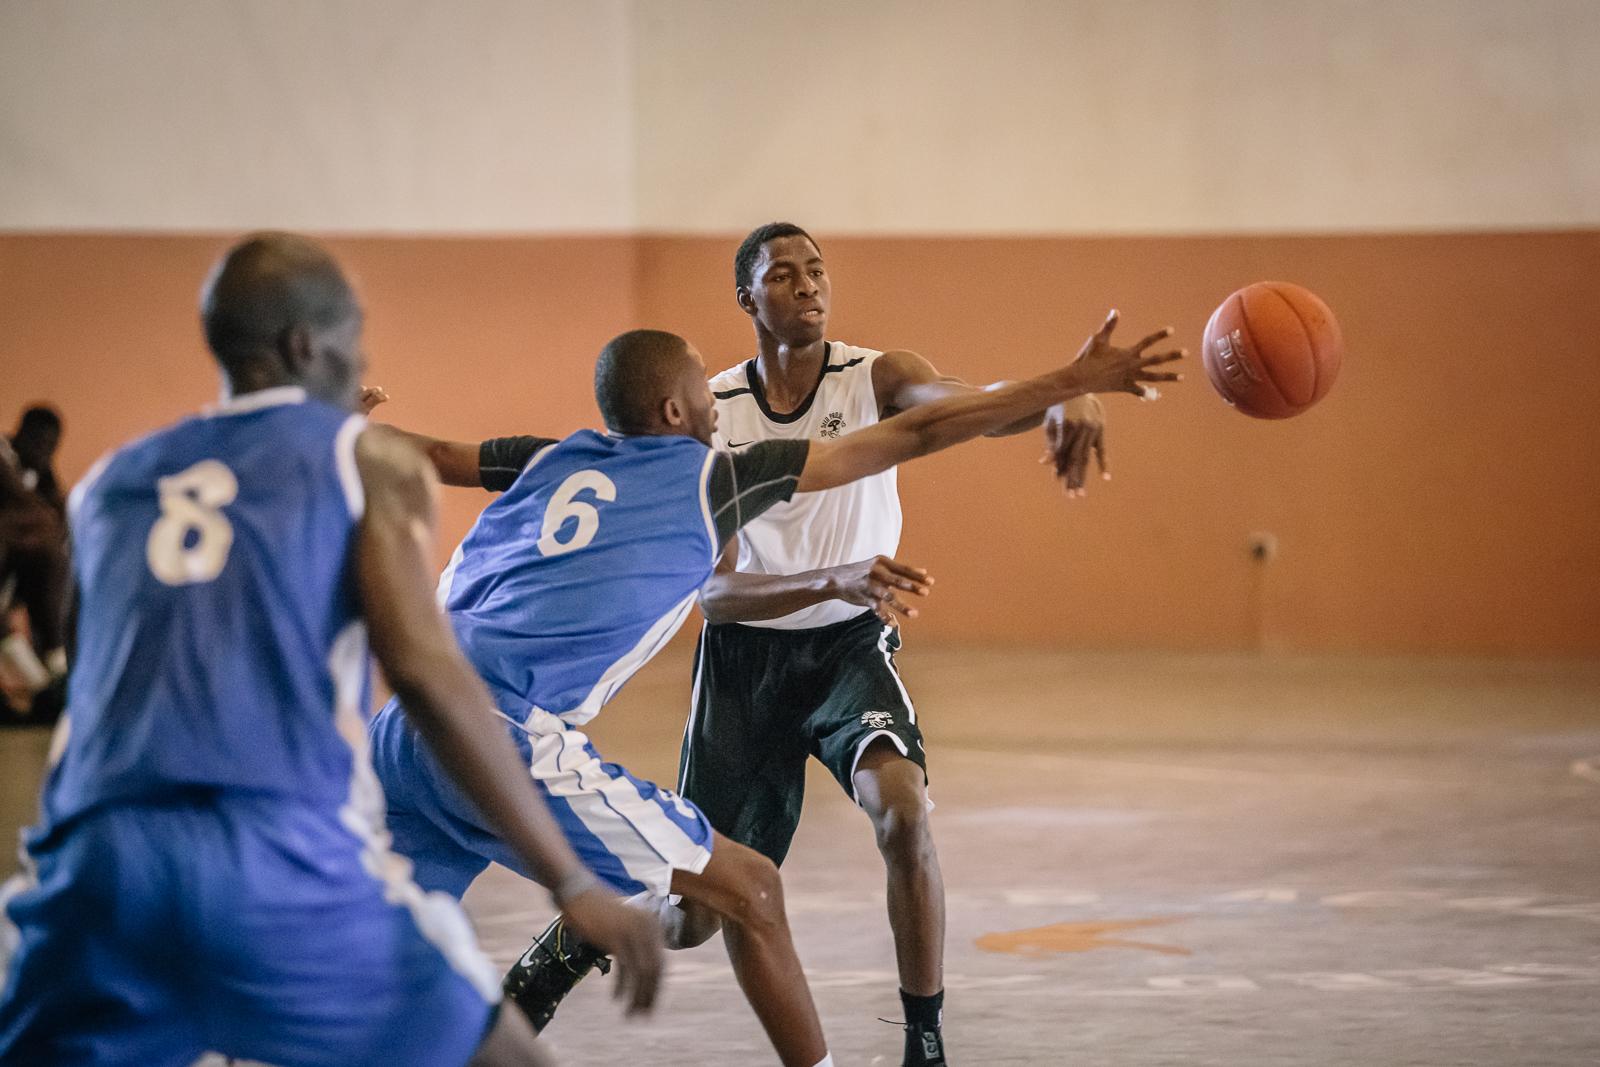 0318_20150531_Seed Academy_thiès_Senegal©KevinCouliau.jpg